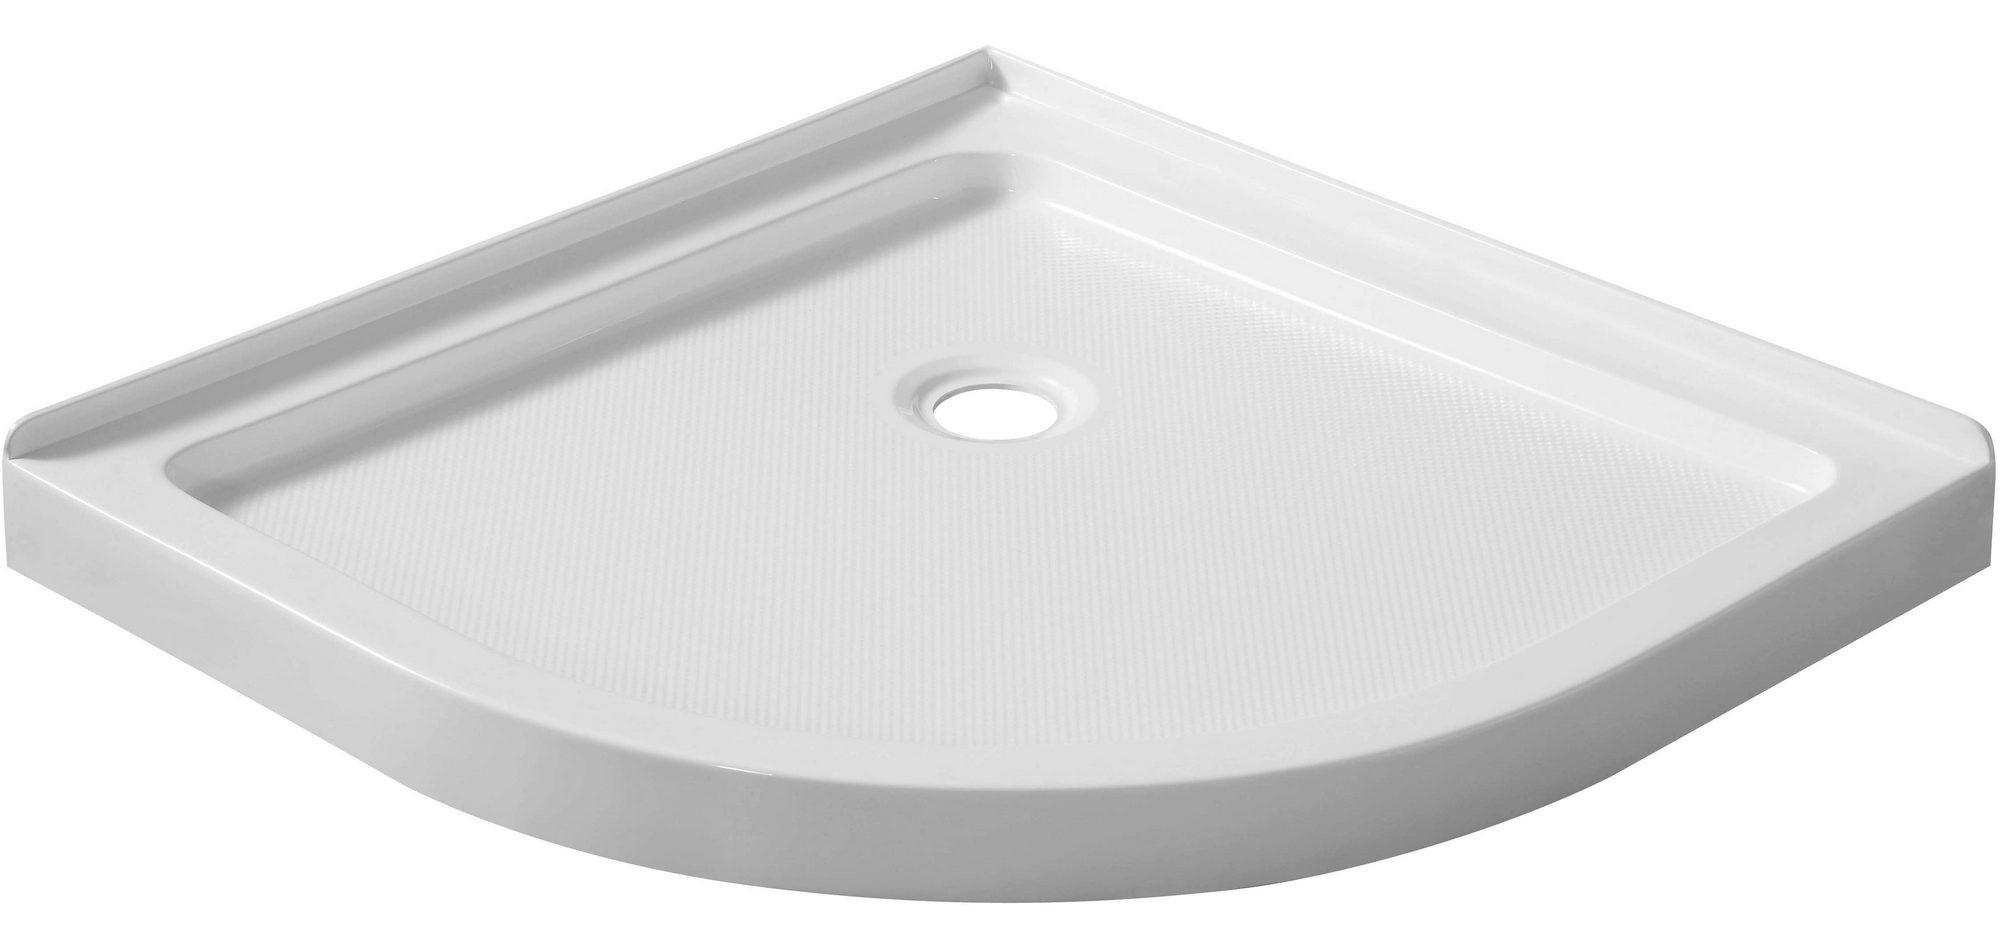 "ANZZI SB-AZ005WN Pillar Series 36x36"" Double Threshold Shower Base in White"